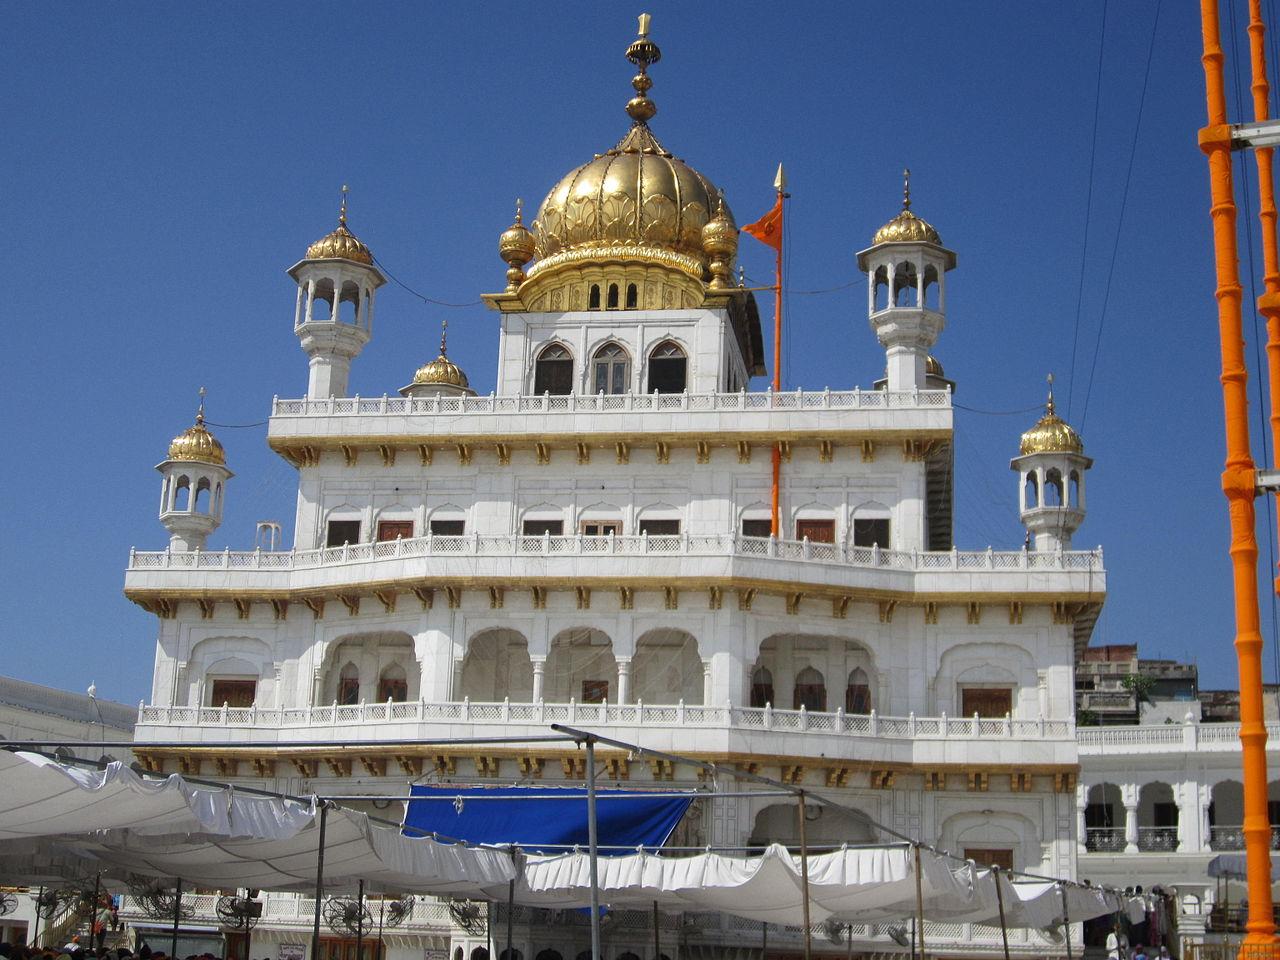 File:Sikh Gurdwara, Punjab.JPG - Wikimedia Commons